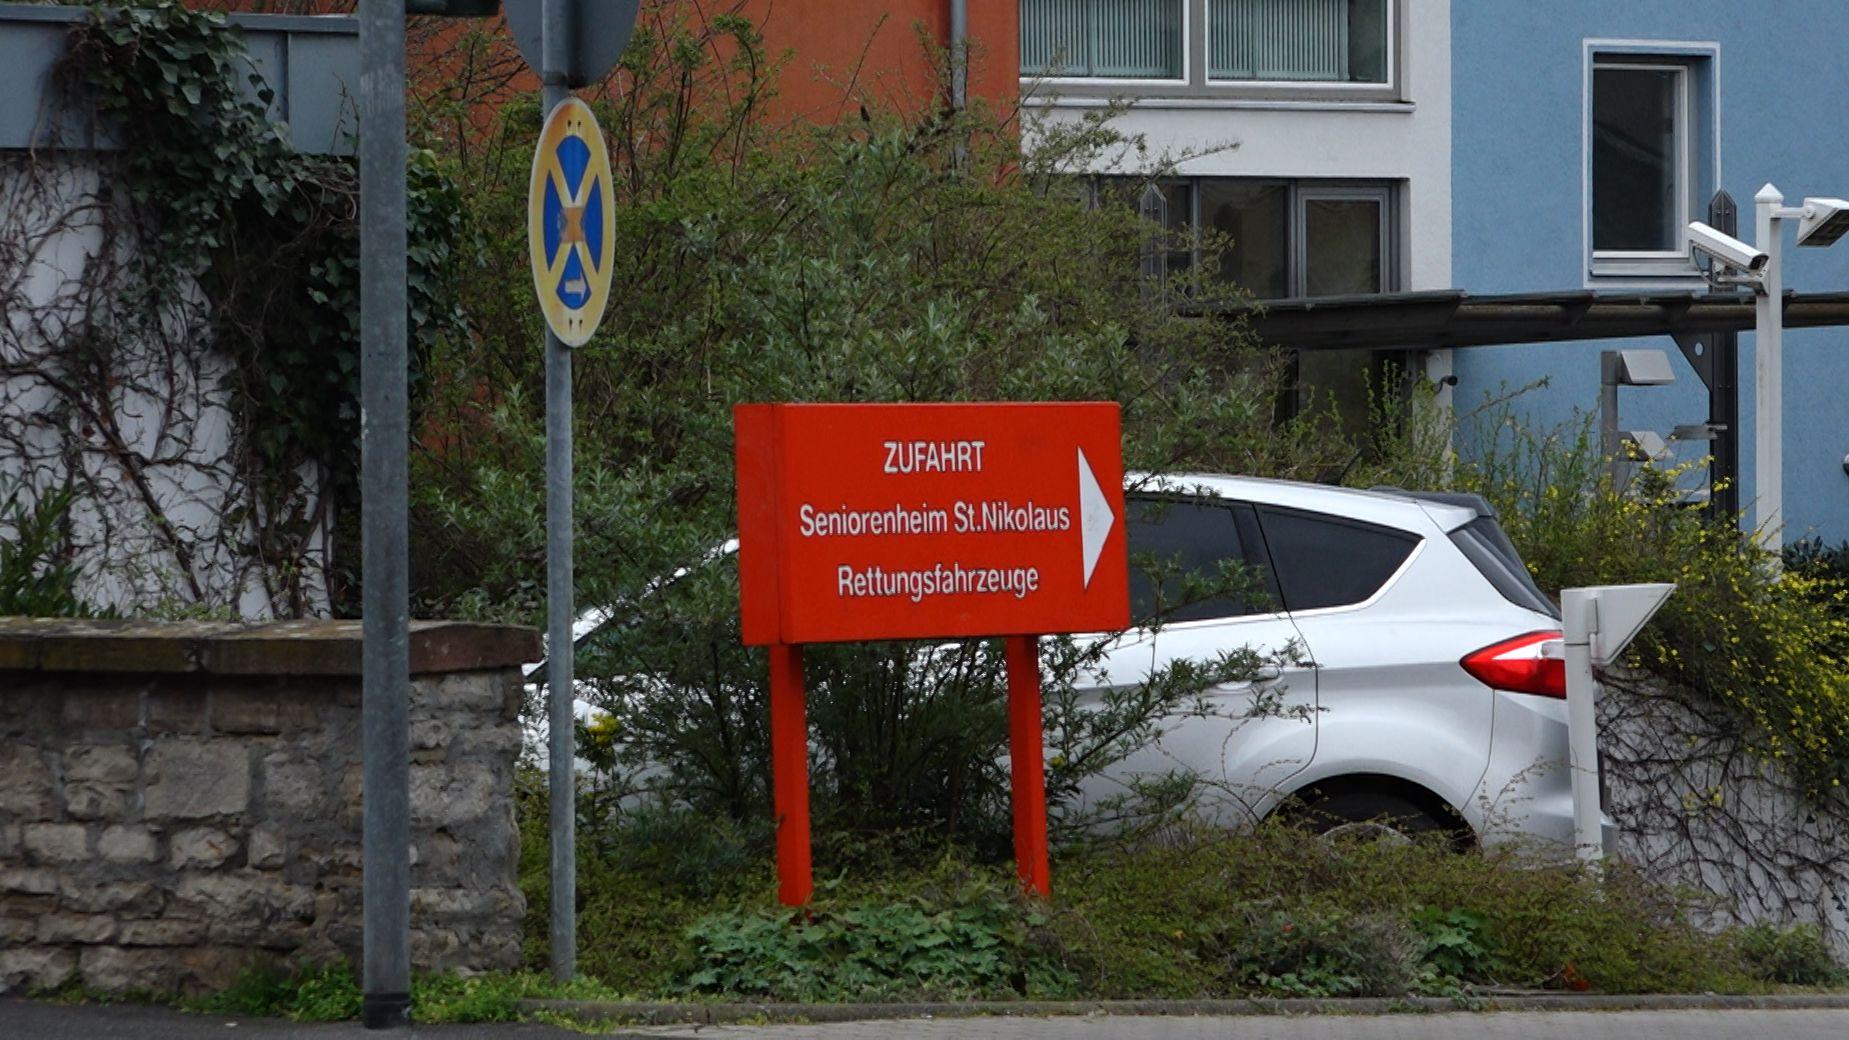 Seniorenheim St. Nikolaus im Würzburger Stadtteil Sanderau